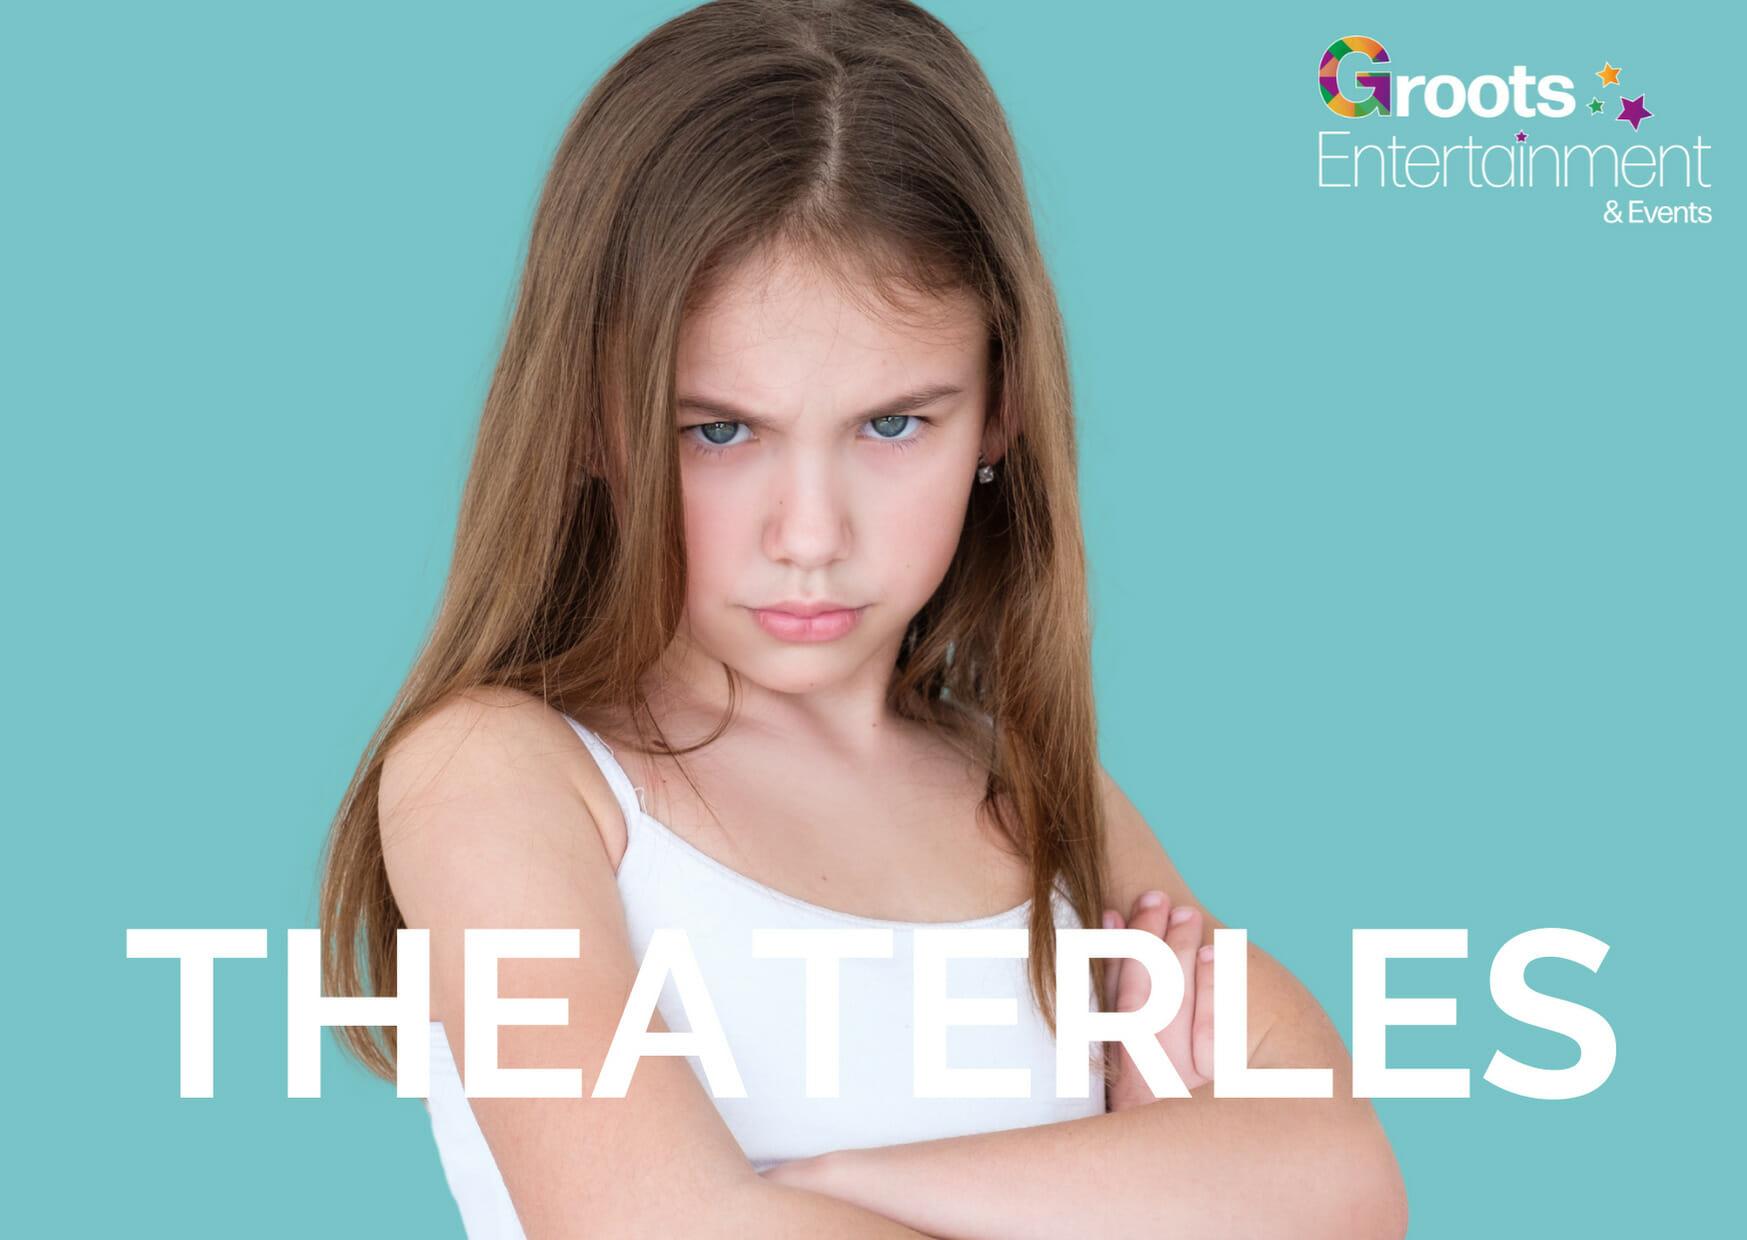 Theaterles